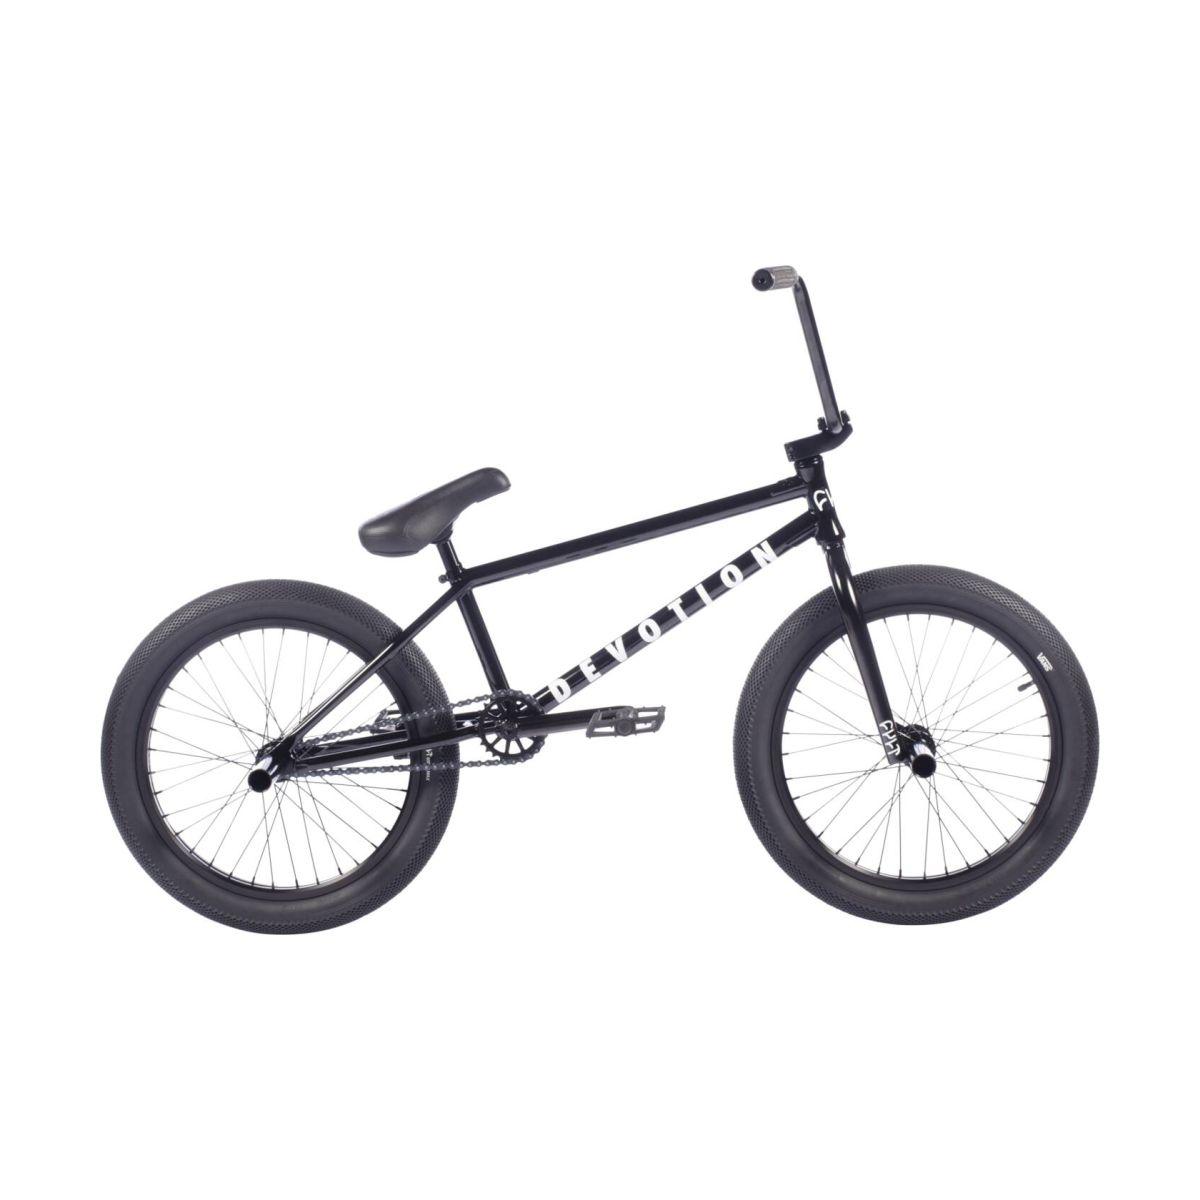 Rower BMX Cult Devotion-A 2021 Black